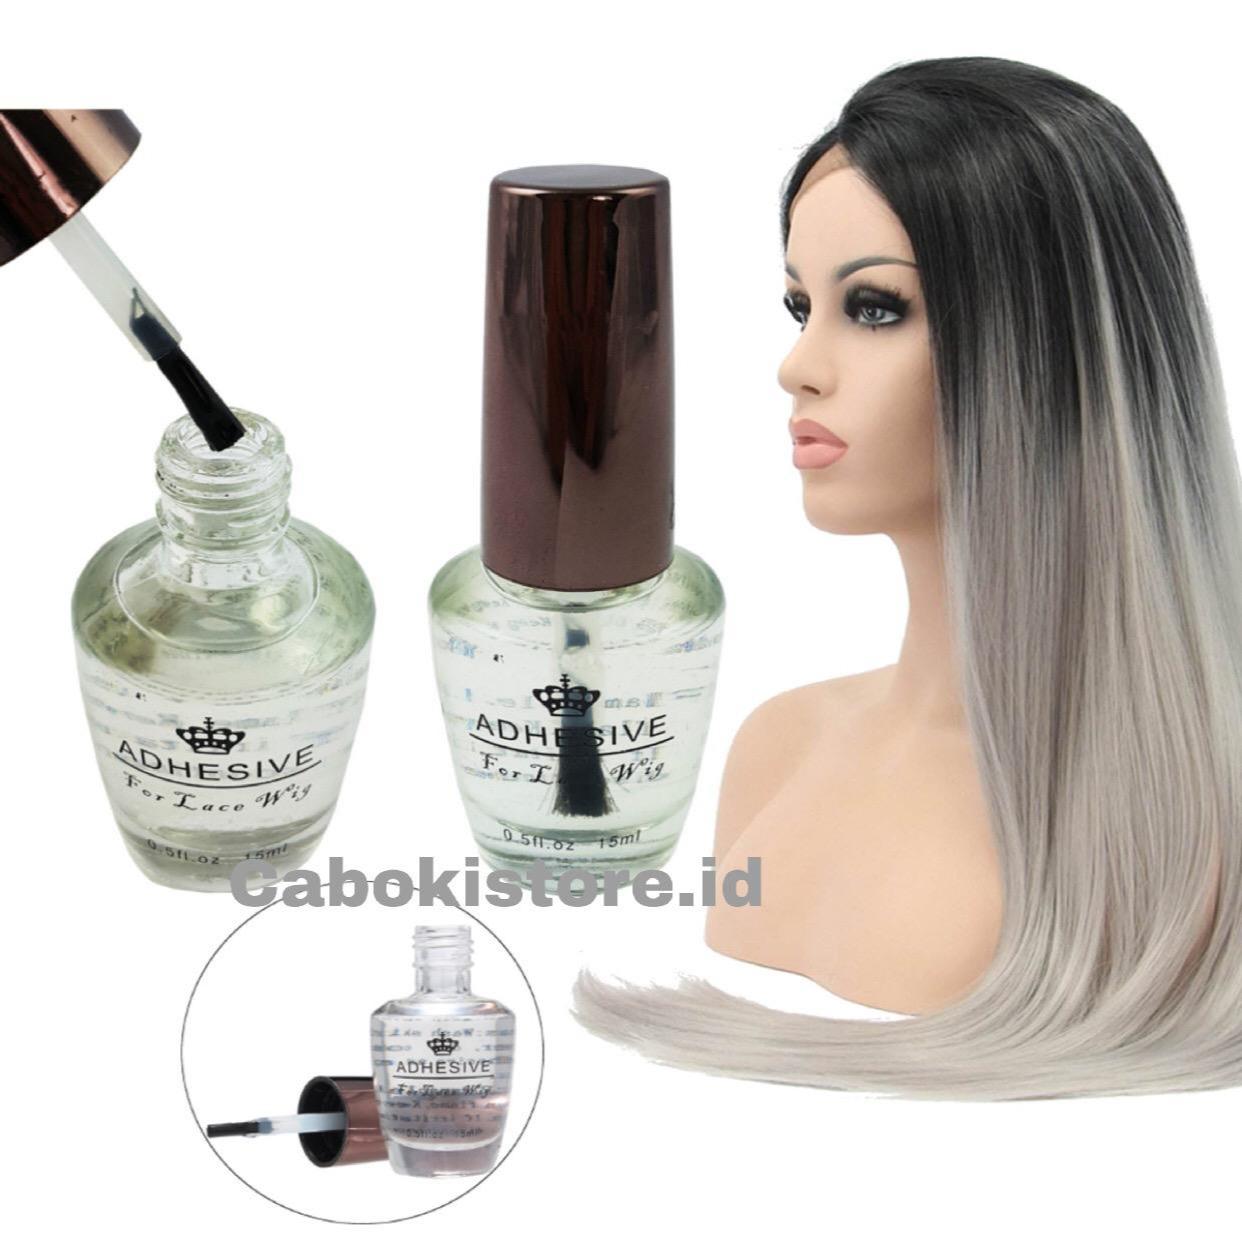 Lem Toupee Glue Toupee Adhesive for Toupee and Hair Wig thumbnail